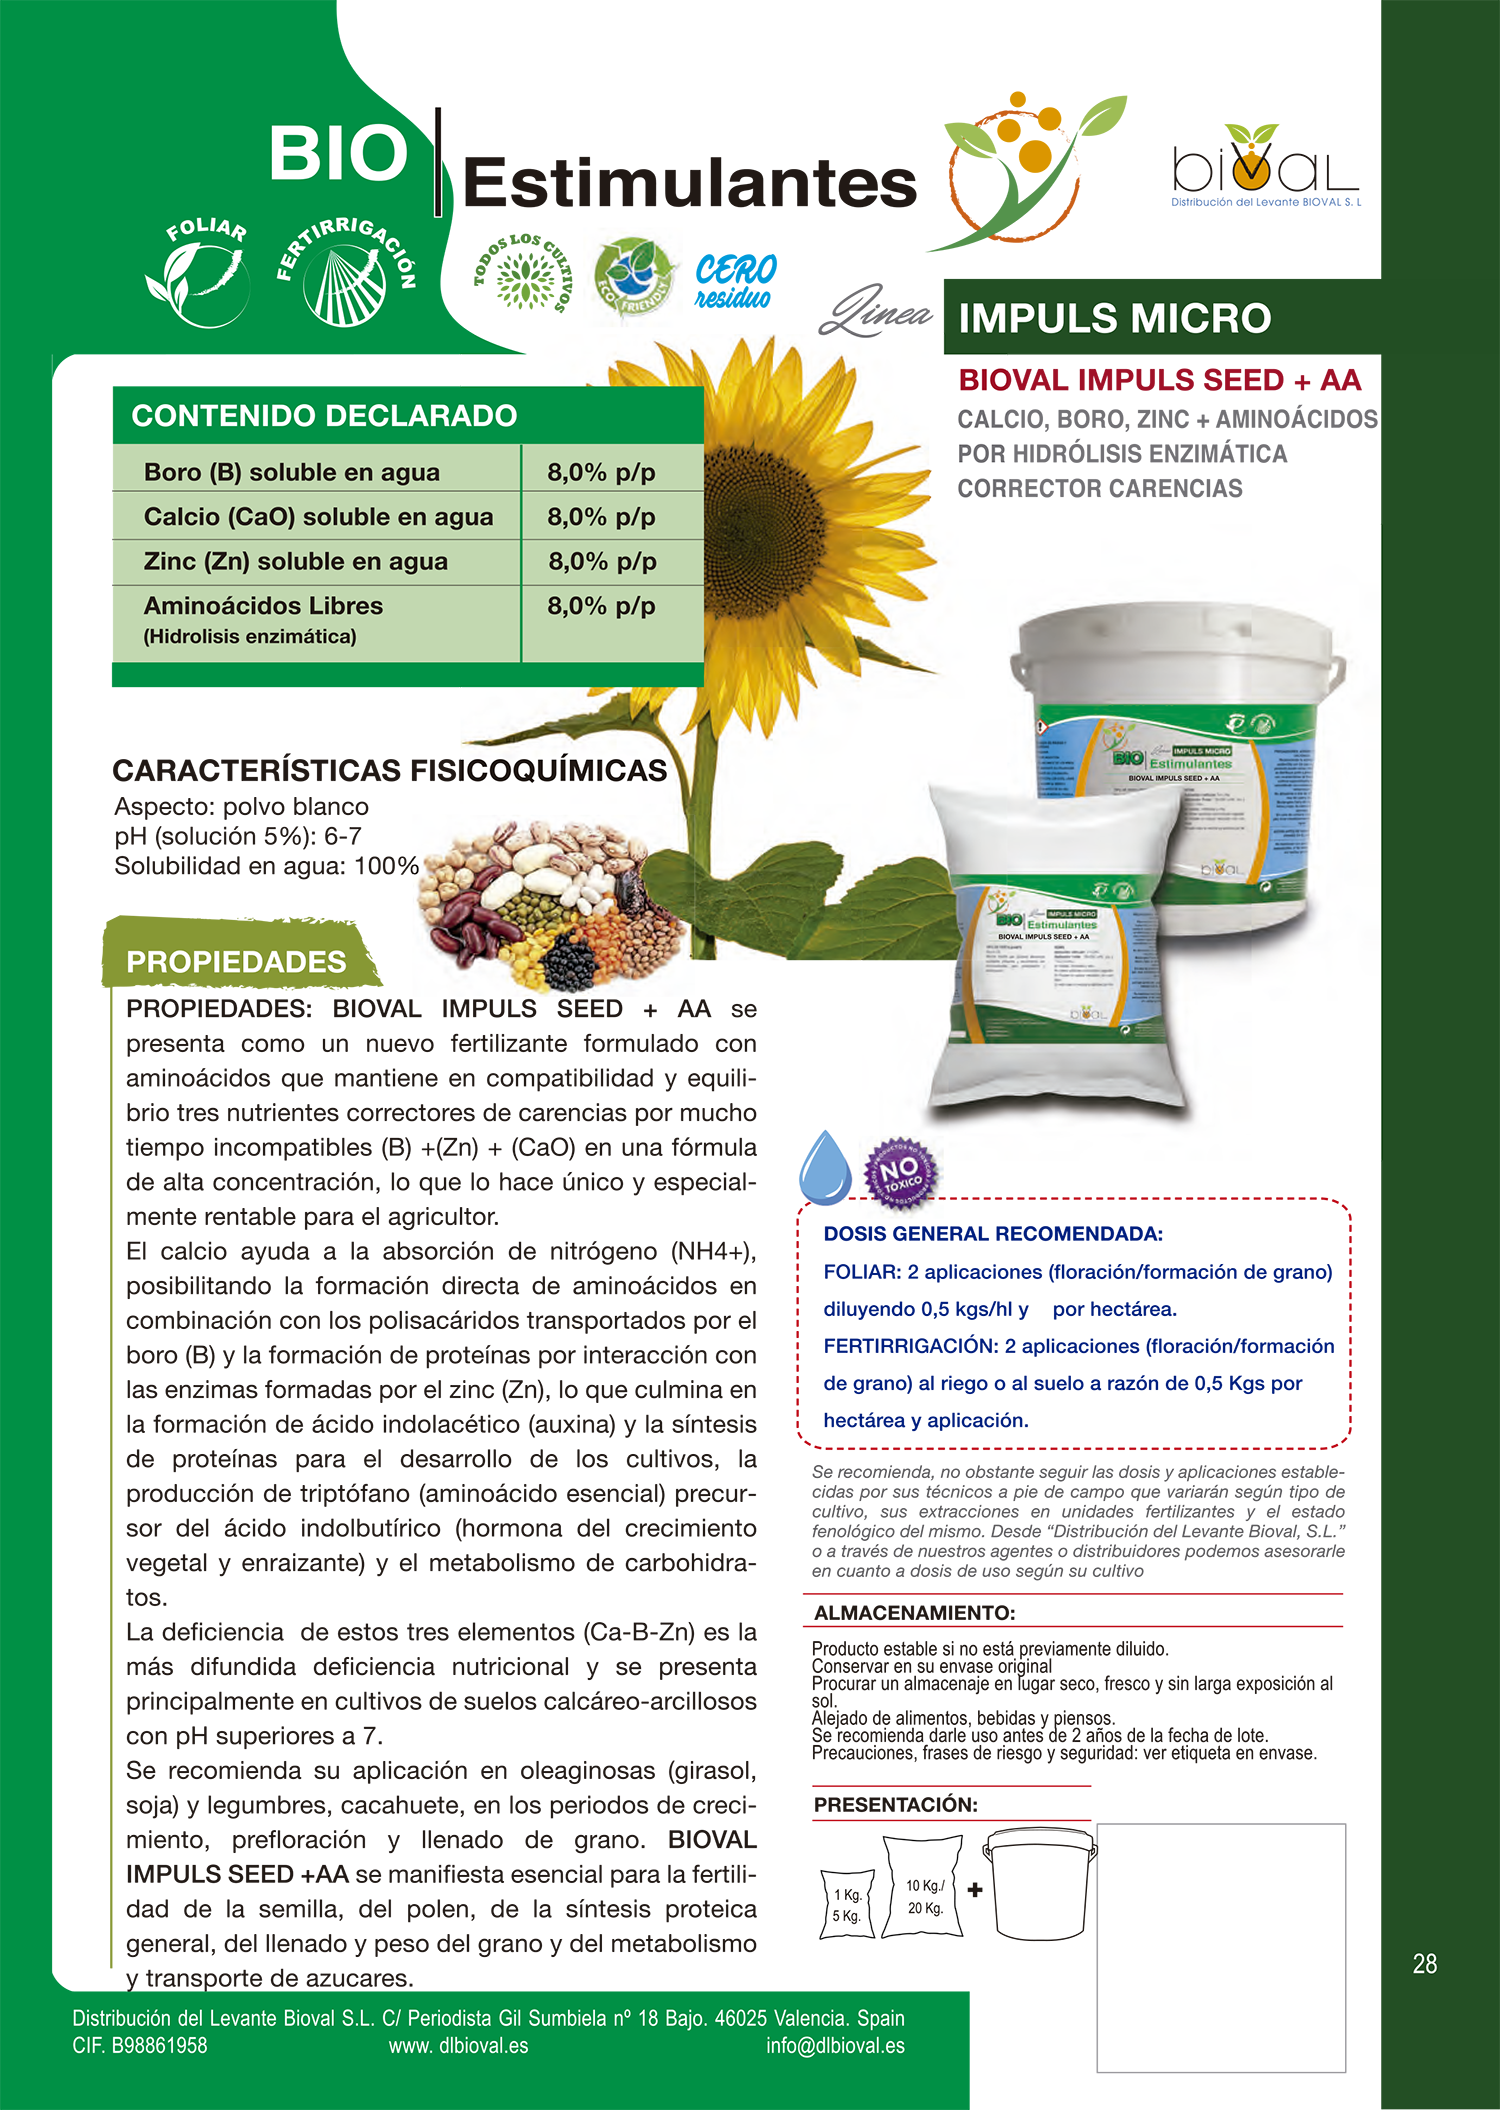 Bioval Impuls SeedAA 1 - Línea Impuls Micro